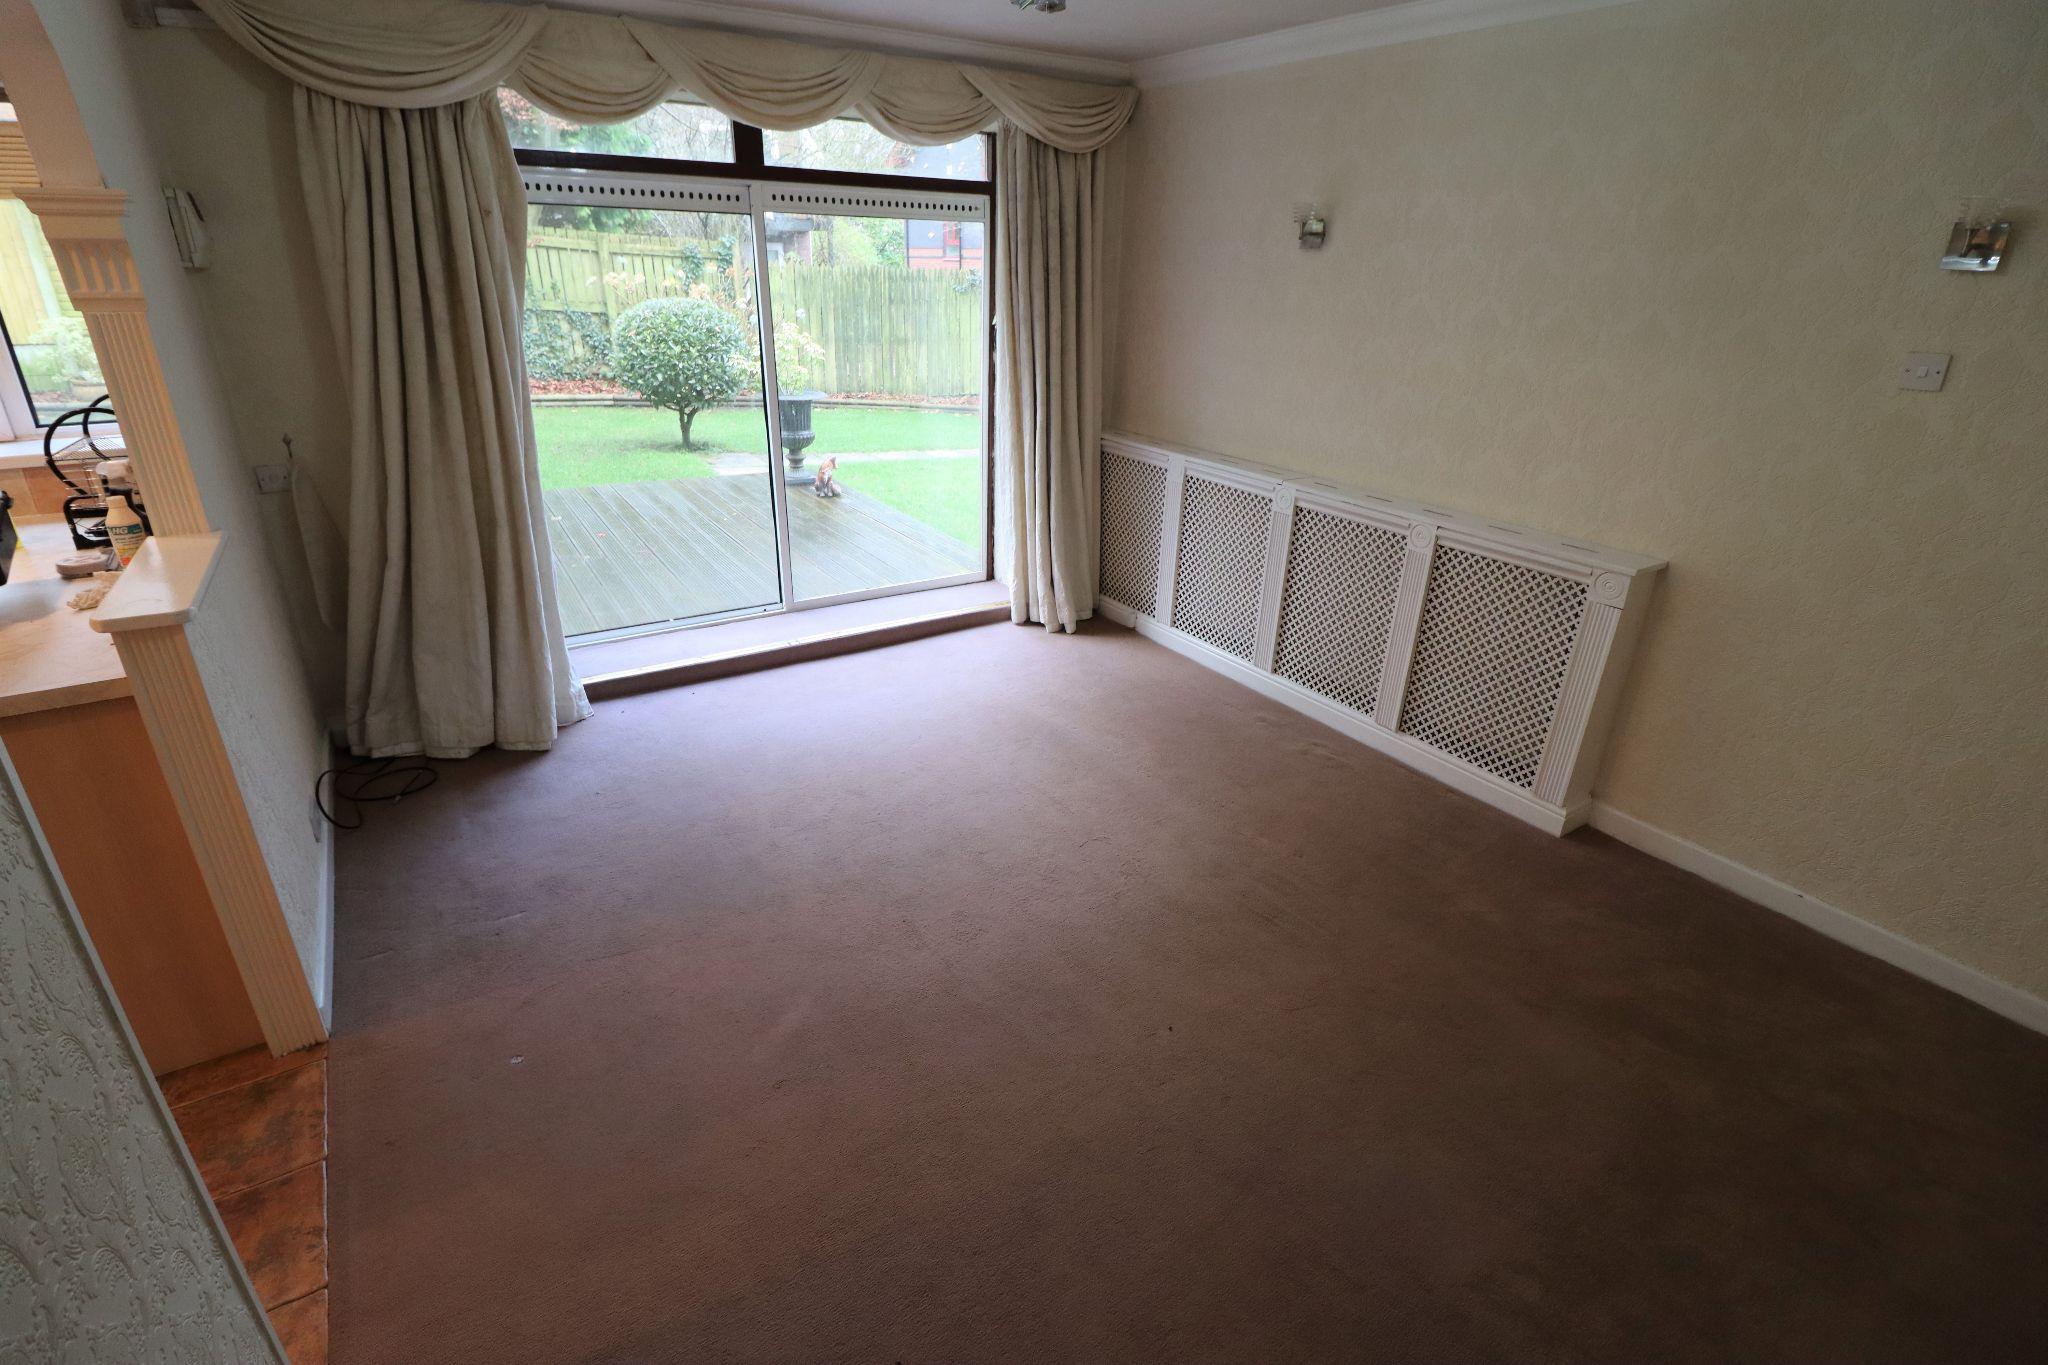 2 Bedroom Ground Floor Flat/apartment To Rent - Photograph 2